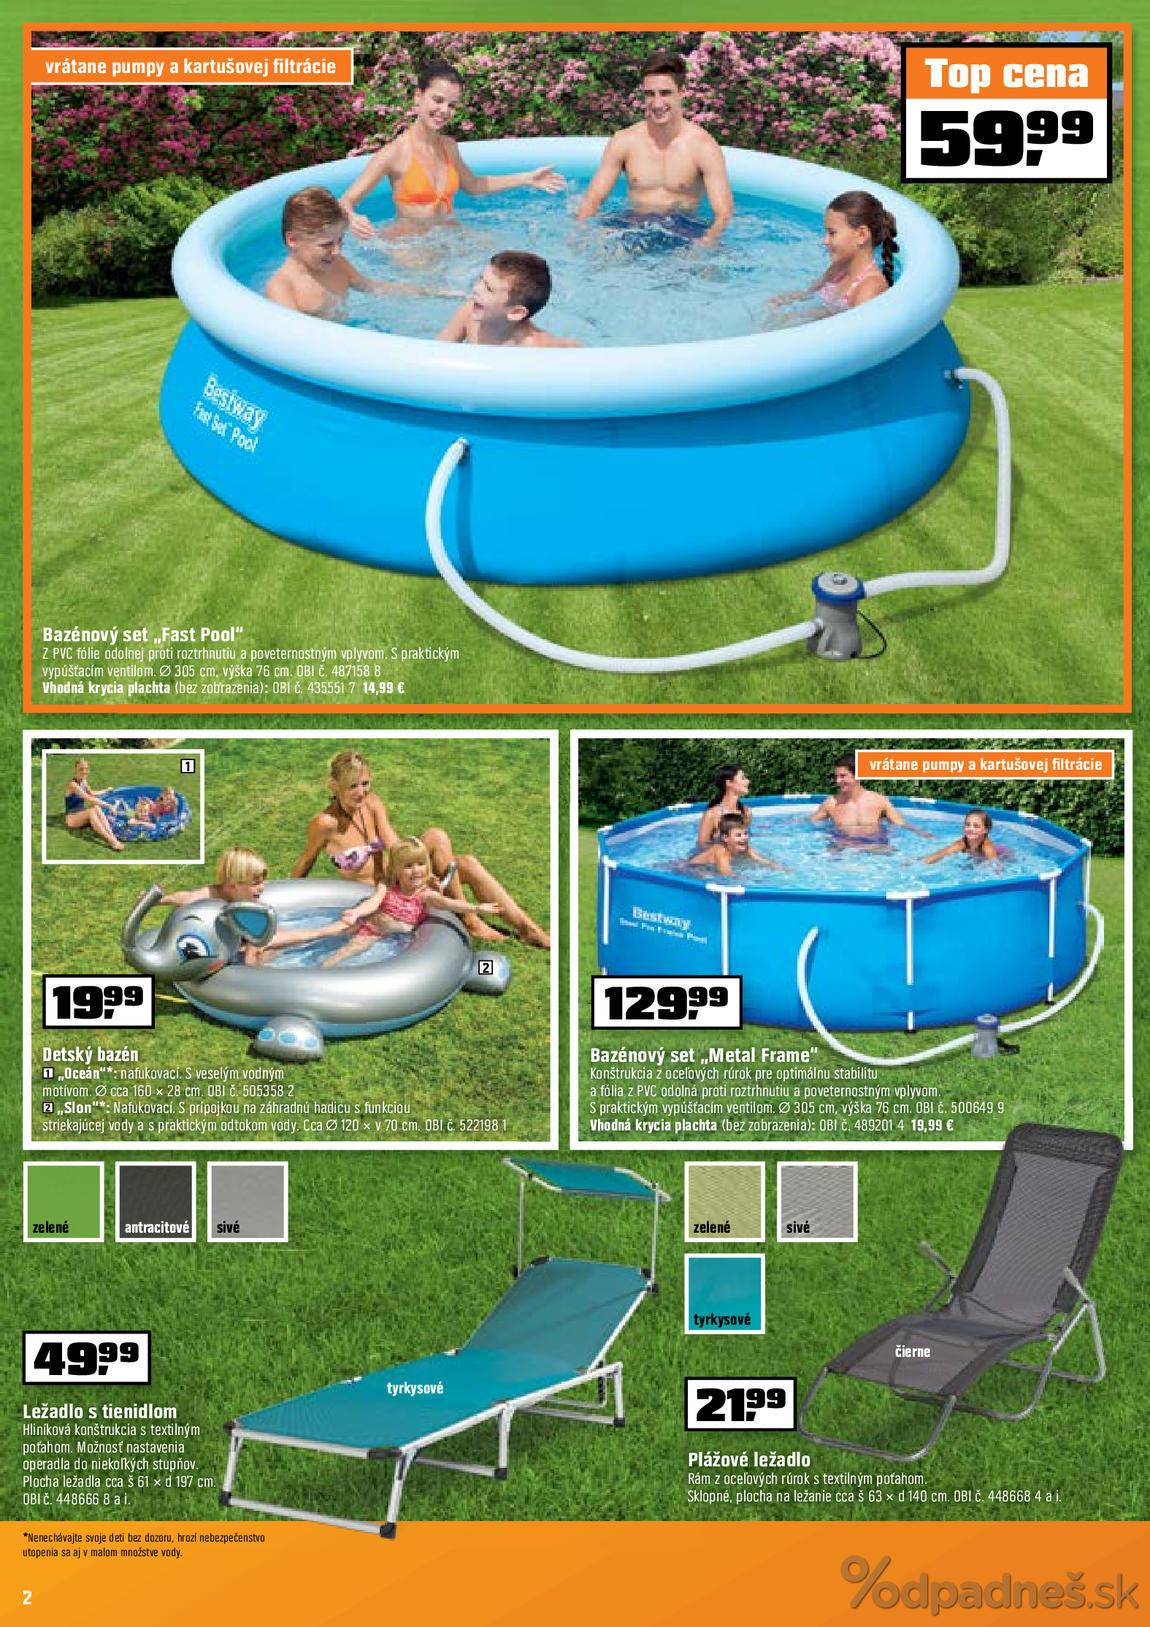 Pool obi cmi pool pavillon beige cm x kaufen bei obi for Obi filtersand pool